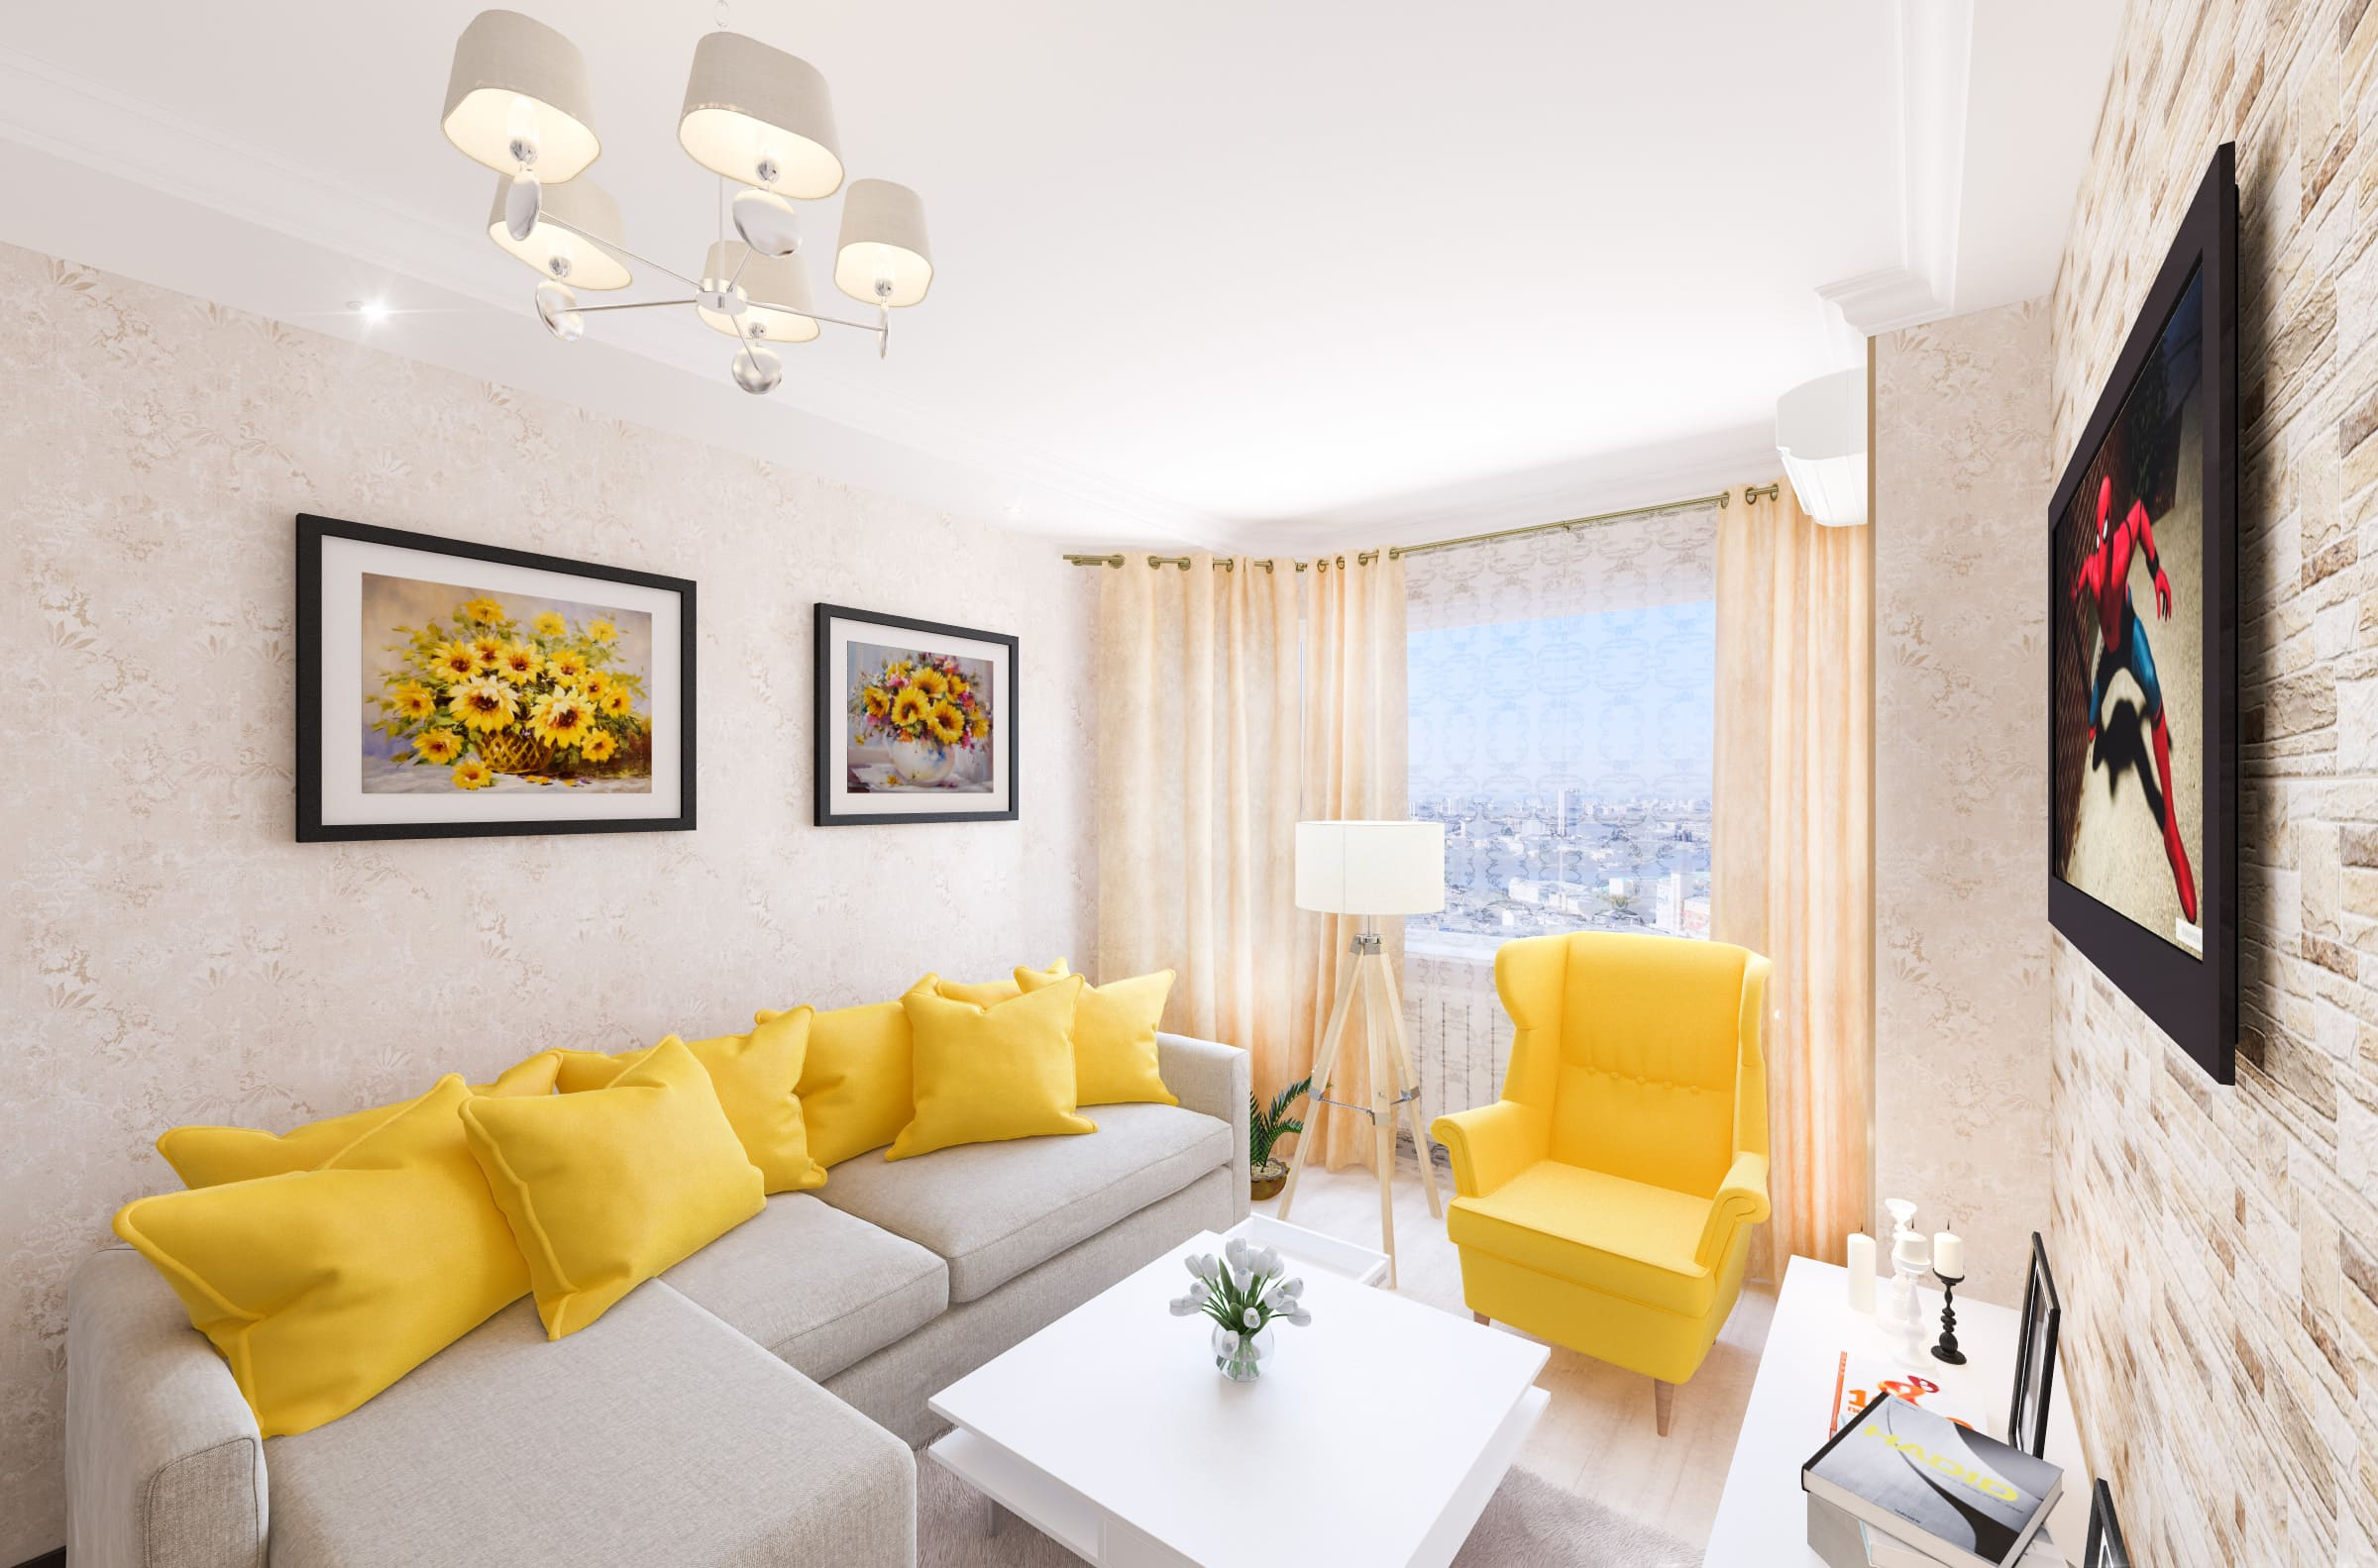 дизайн интерьера гостиной, желтое кресло, желтые подушки, желтые картины, журнальный столик икеа